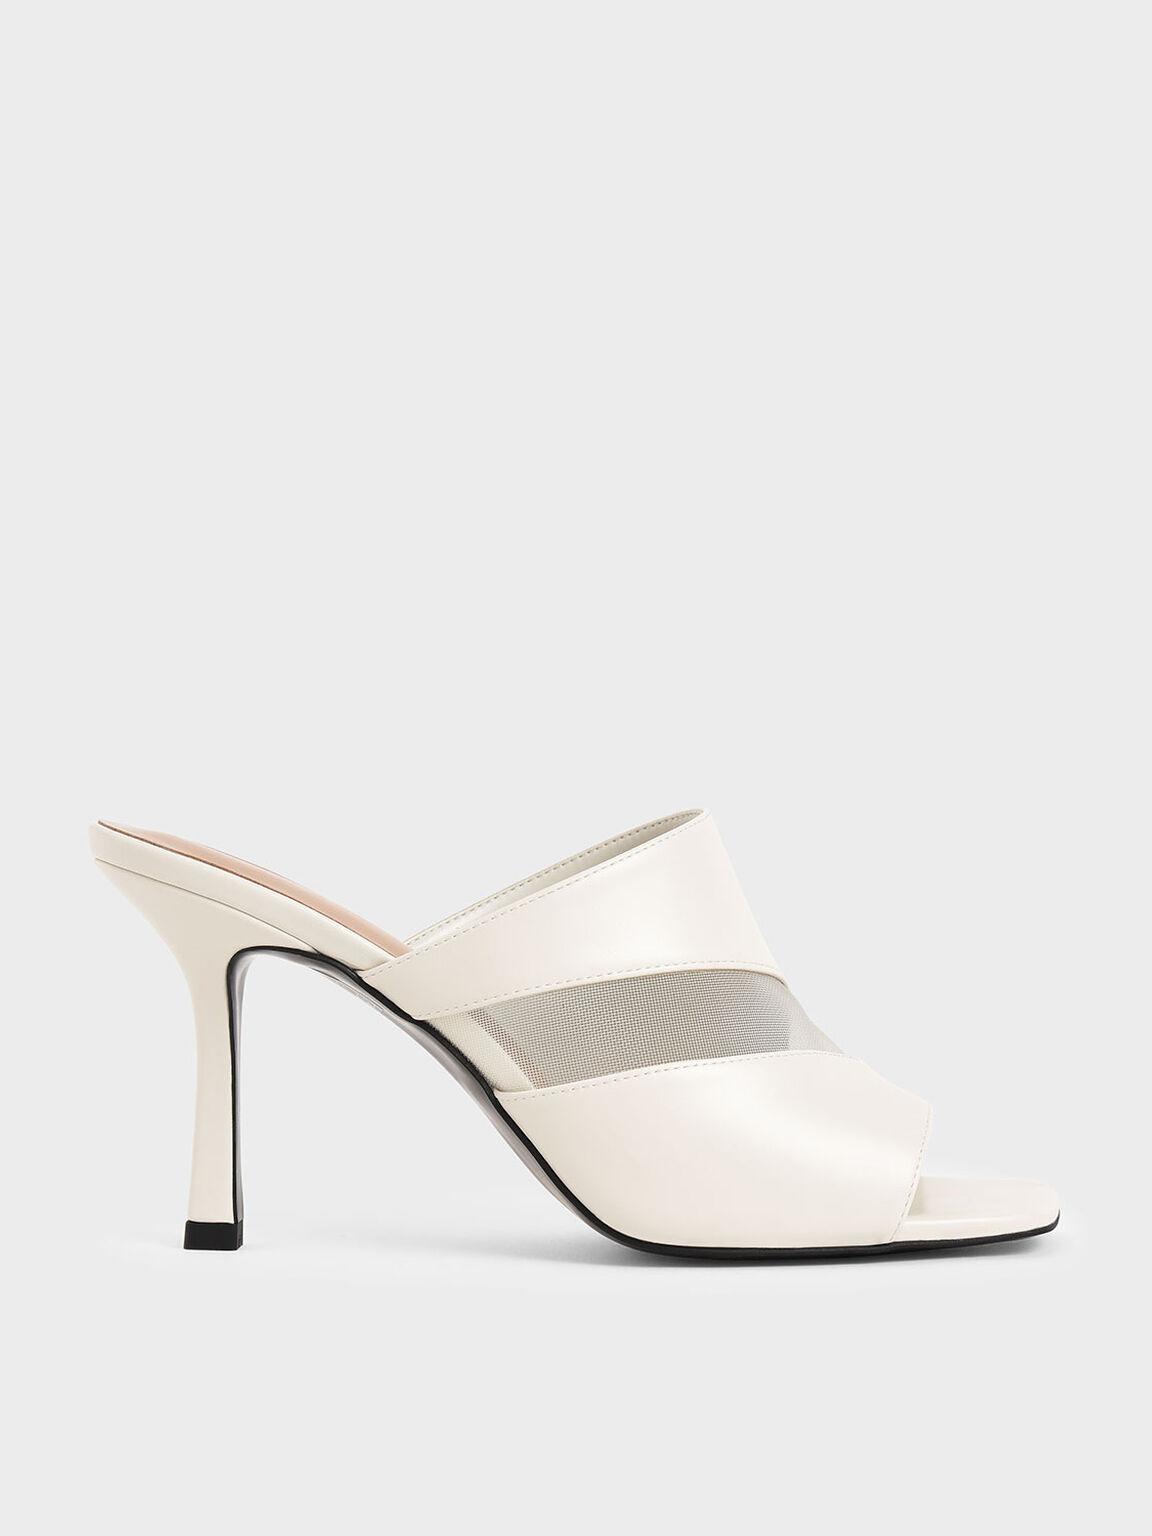 網紗高跟拖鞋, 石灰白, hi-res